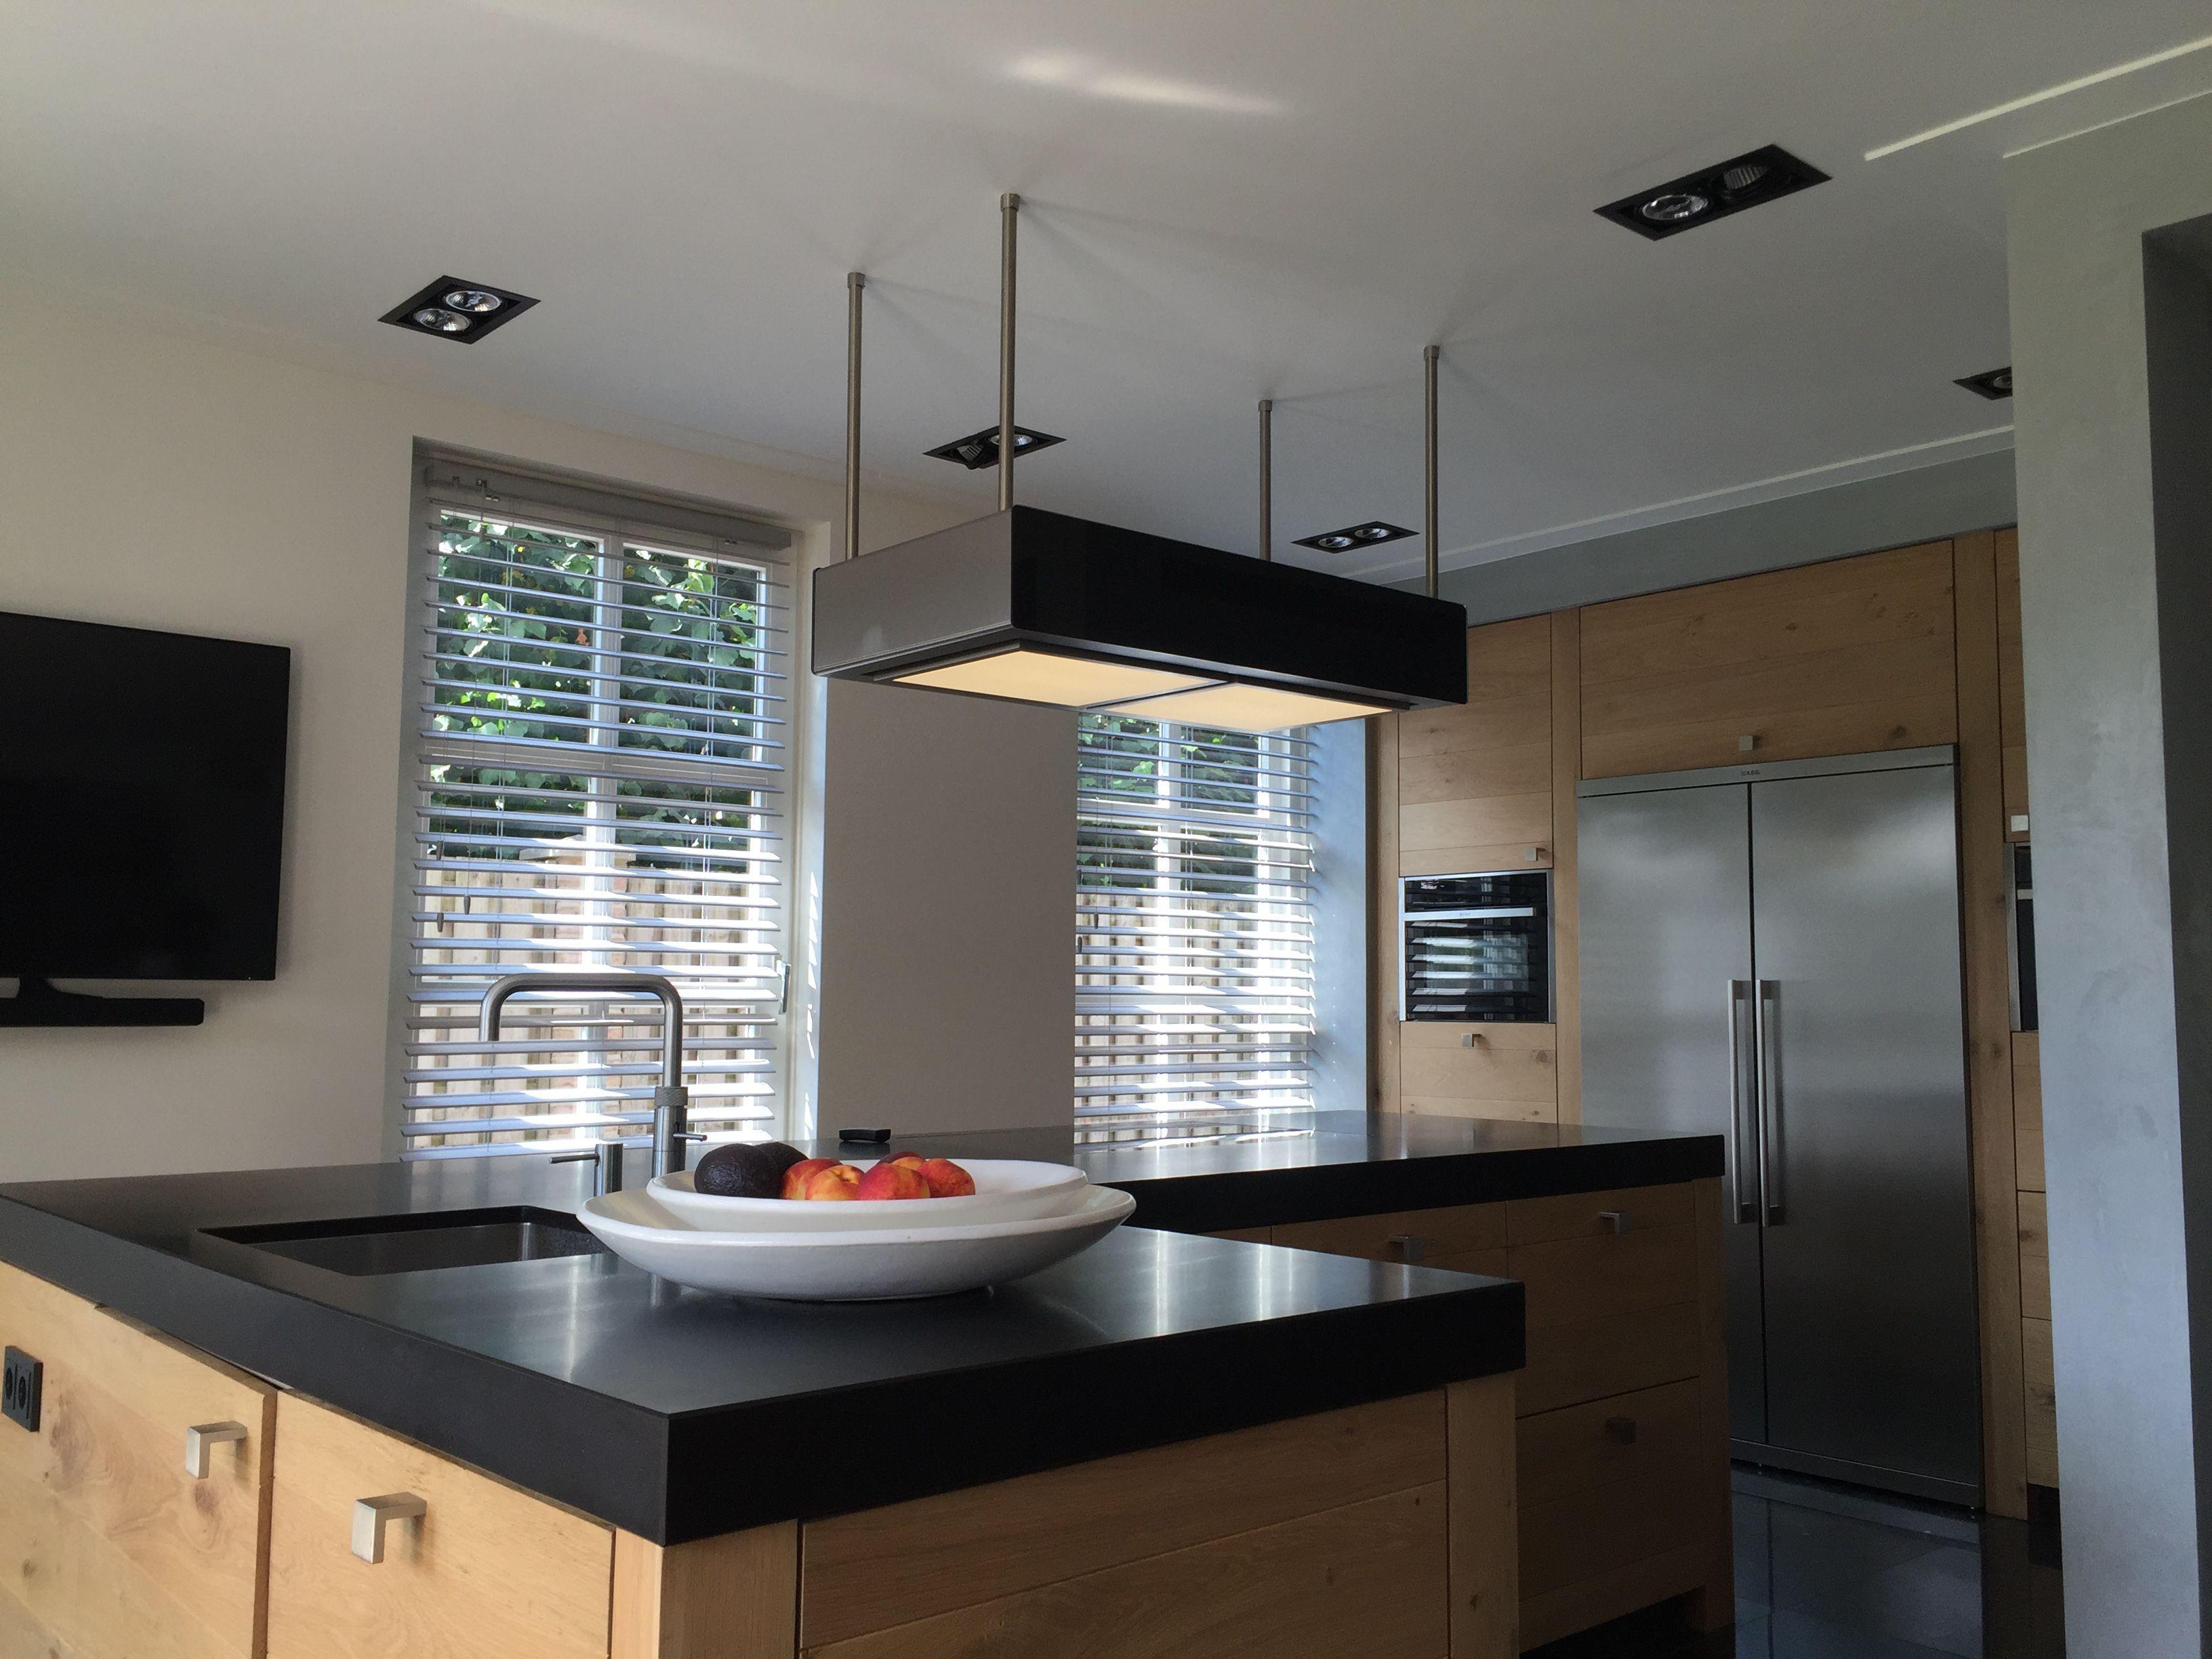 led verlichting keuken plafond free cool led keuken koop goedkope led keuken with zwevend plafond